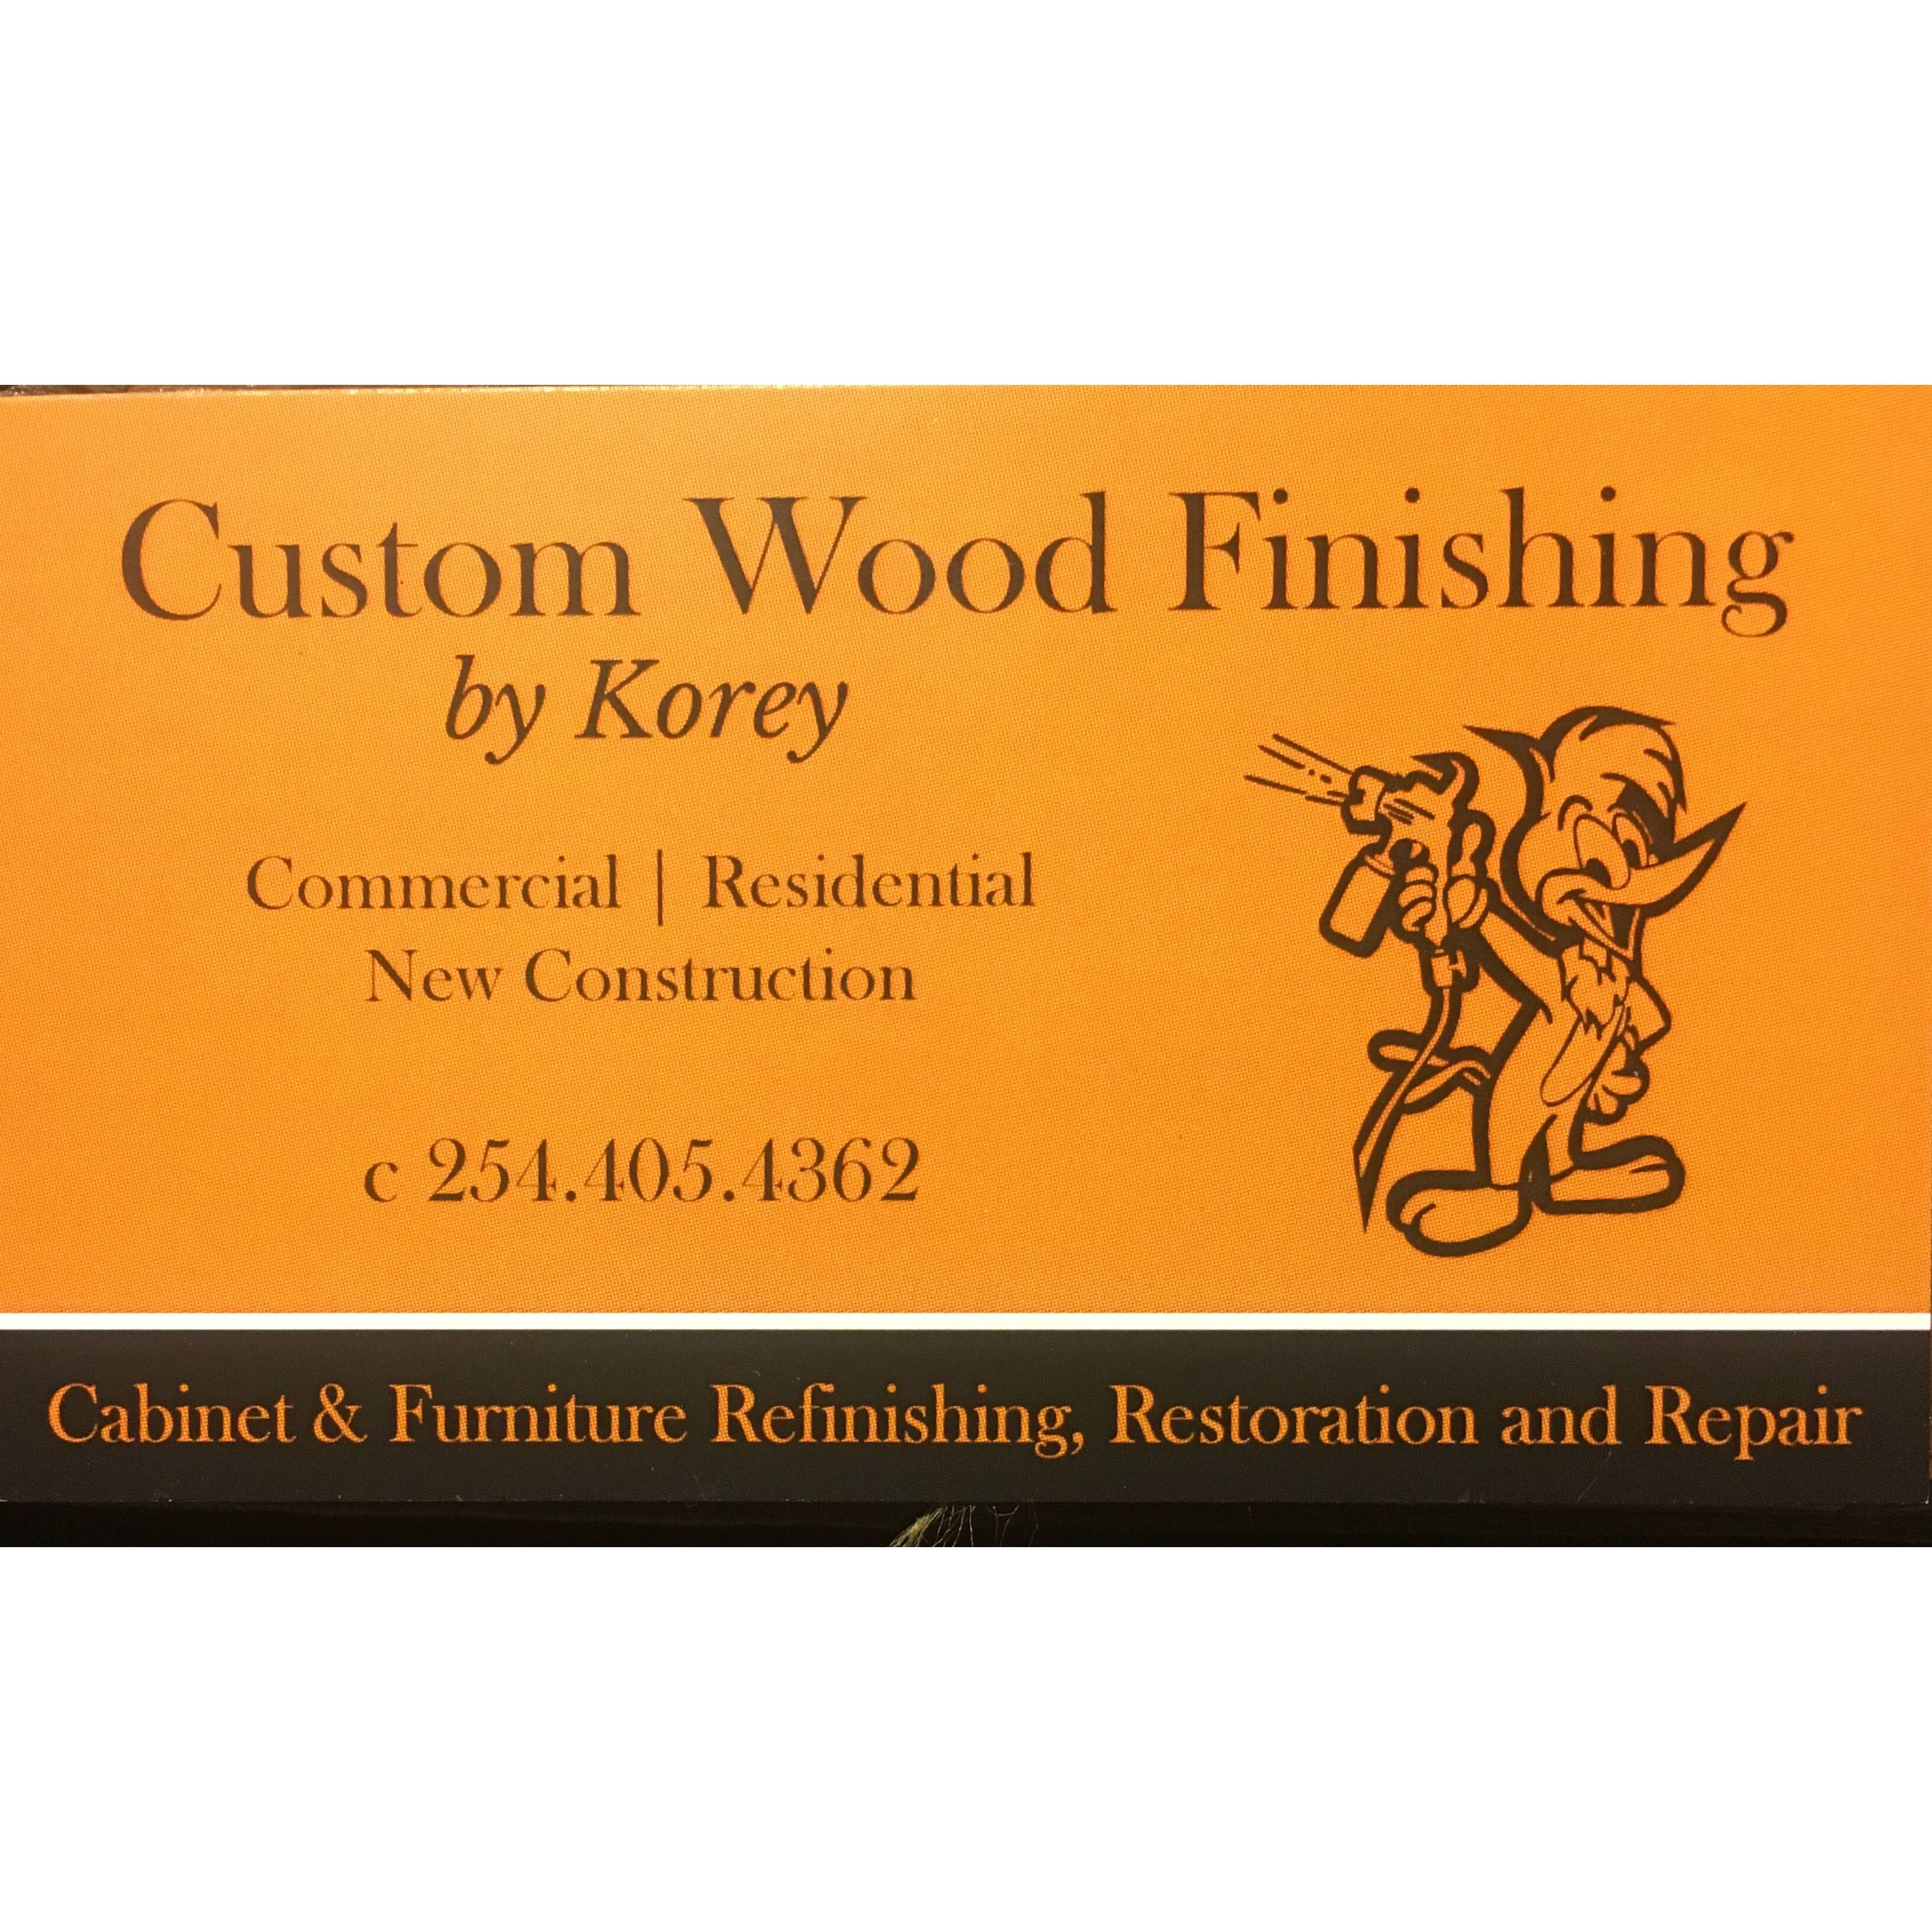 Custom Wood Finishing by Korey - Waco, TX - Carpenters